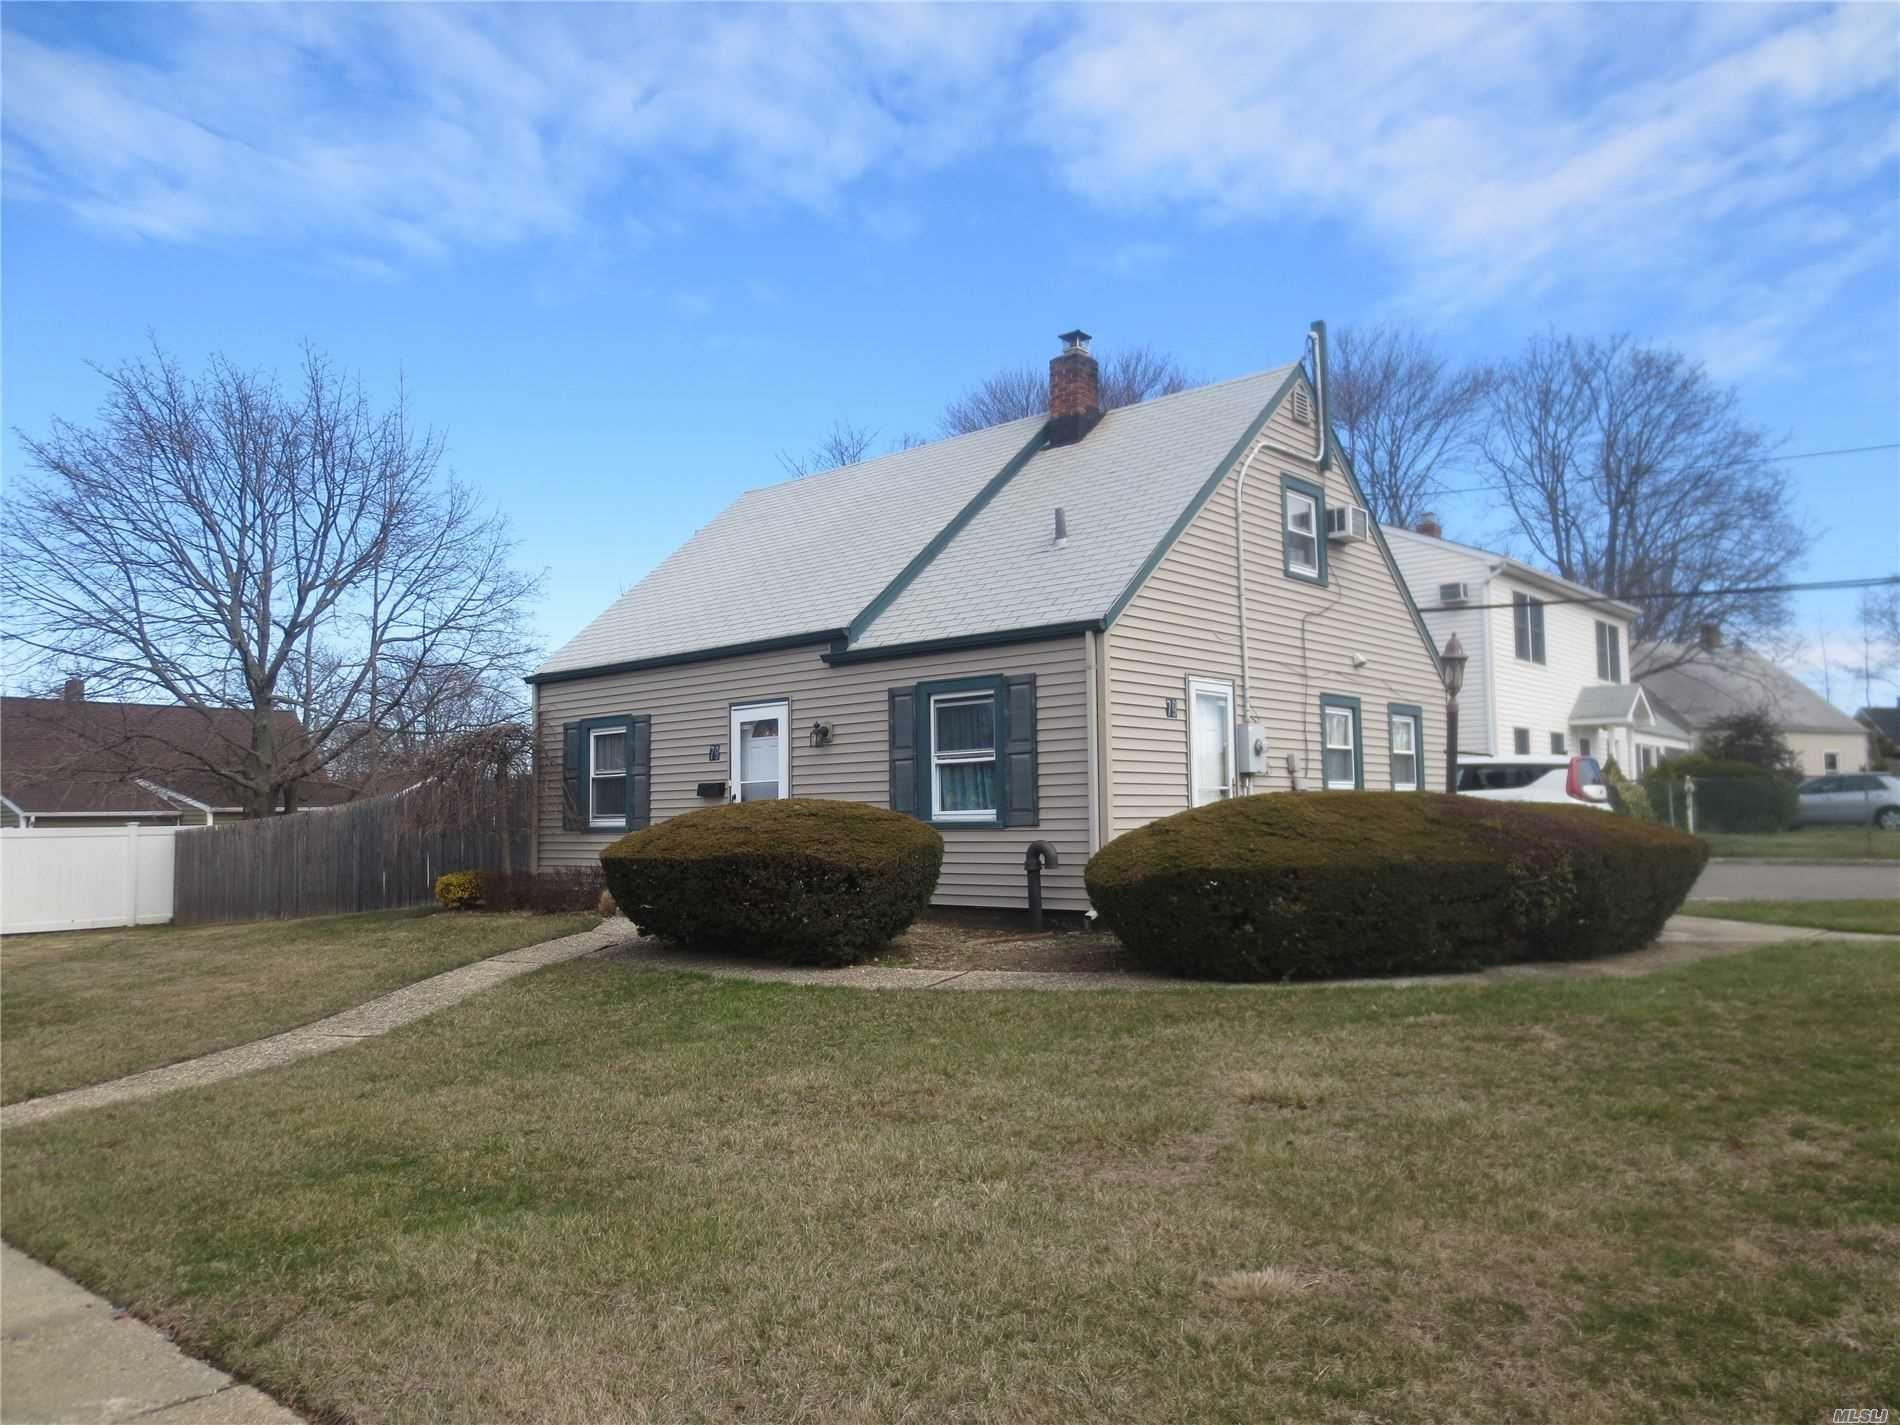 79 Shelter Lane, Levittown, NY 11756 - MLS#: 3208350